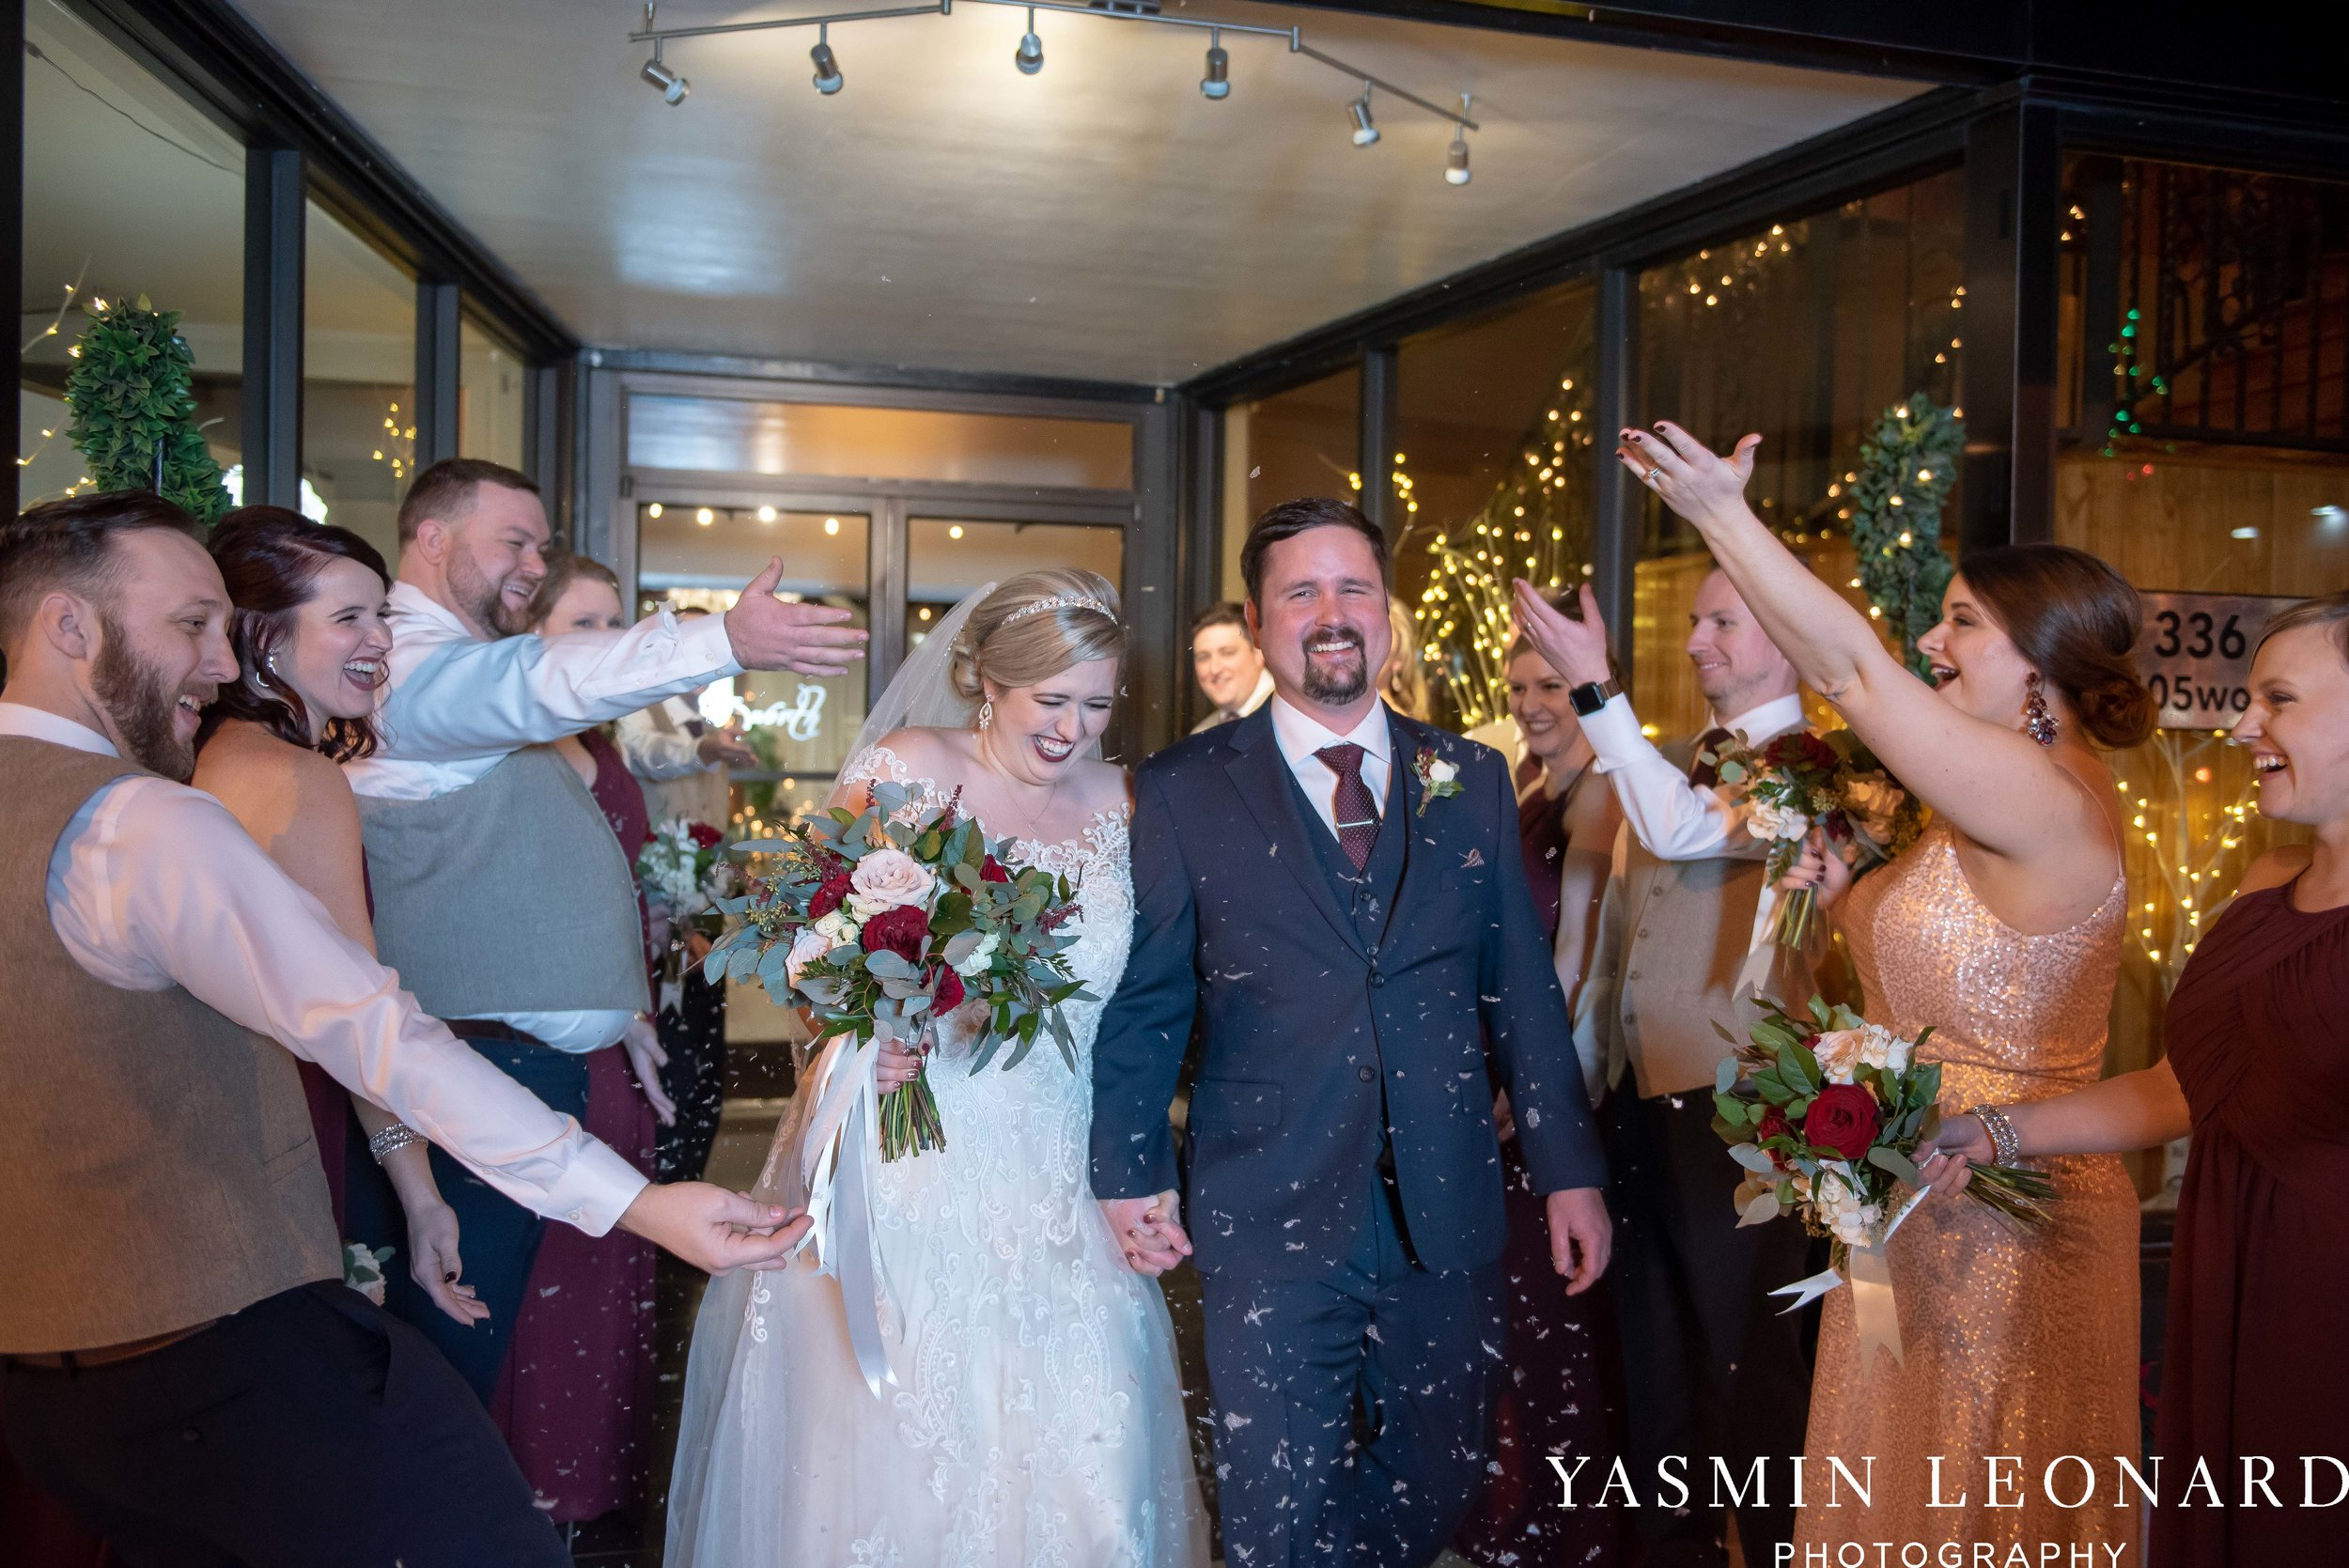 Rebekah and Matt - 105 Worth Event Centre - Yasmin Leonard Photography - Asheboro Wedding - NC Wedding - High Point Weddings - Triad Weddings - Winter Wedding-37.jpg